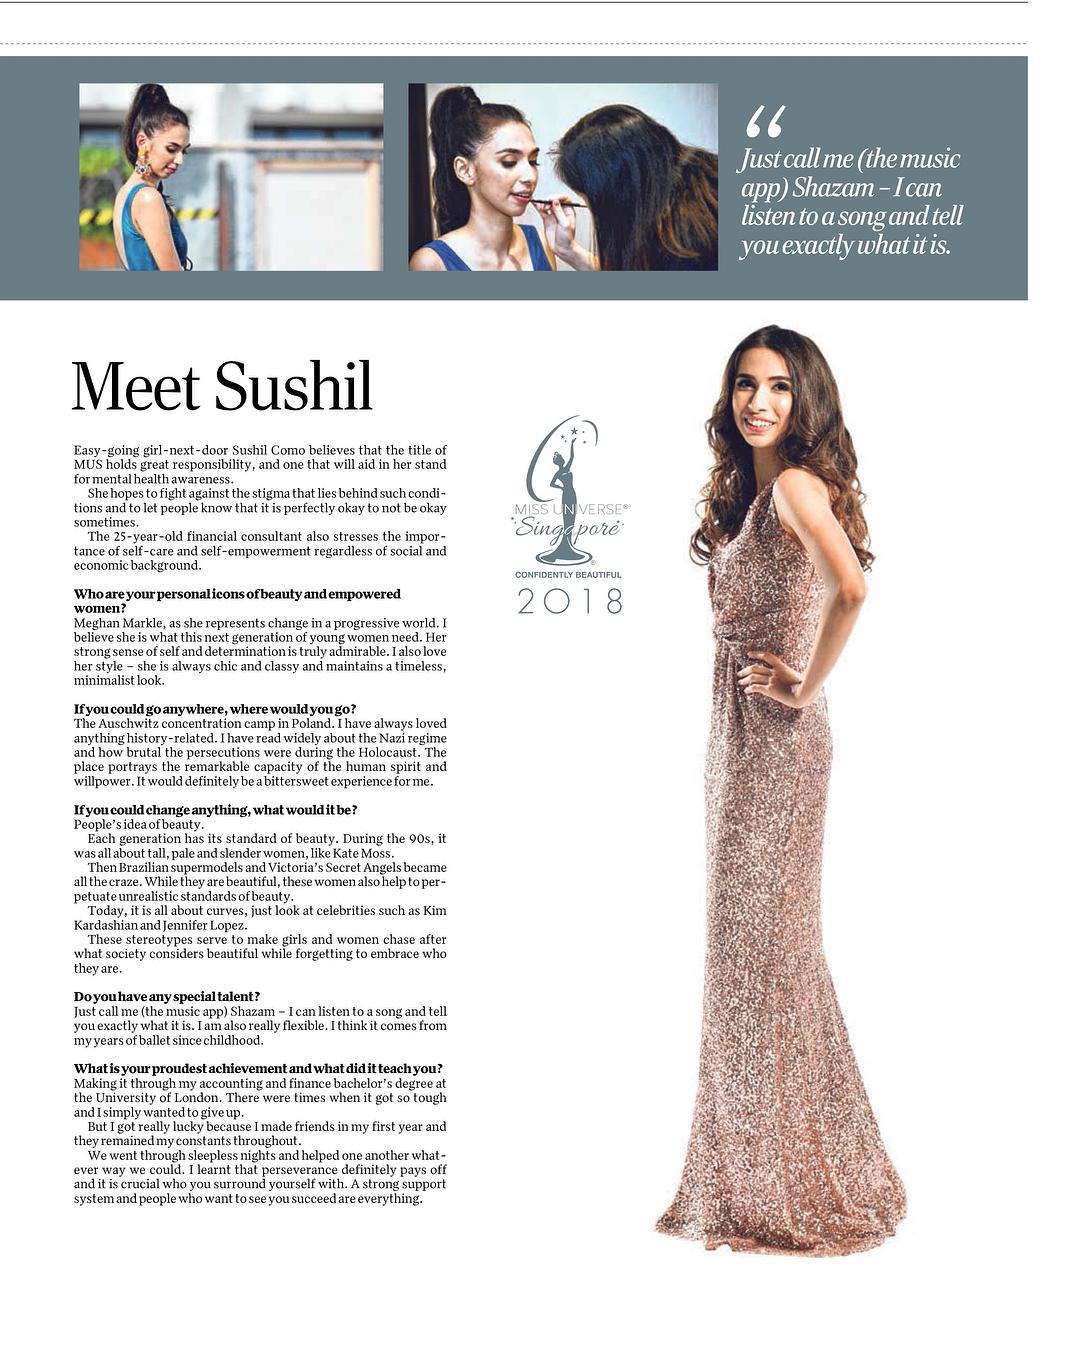 candidatas a miss universe singapore 2018. final: 31 agosto. - Página 5 Npf5niue